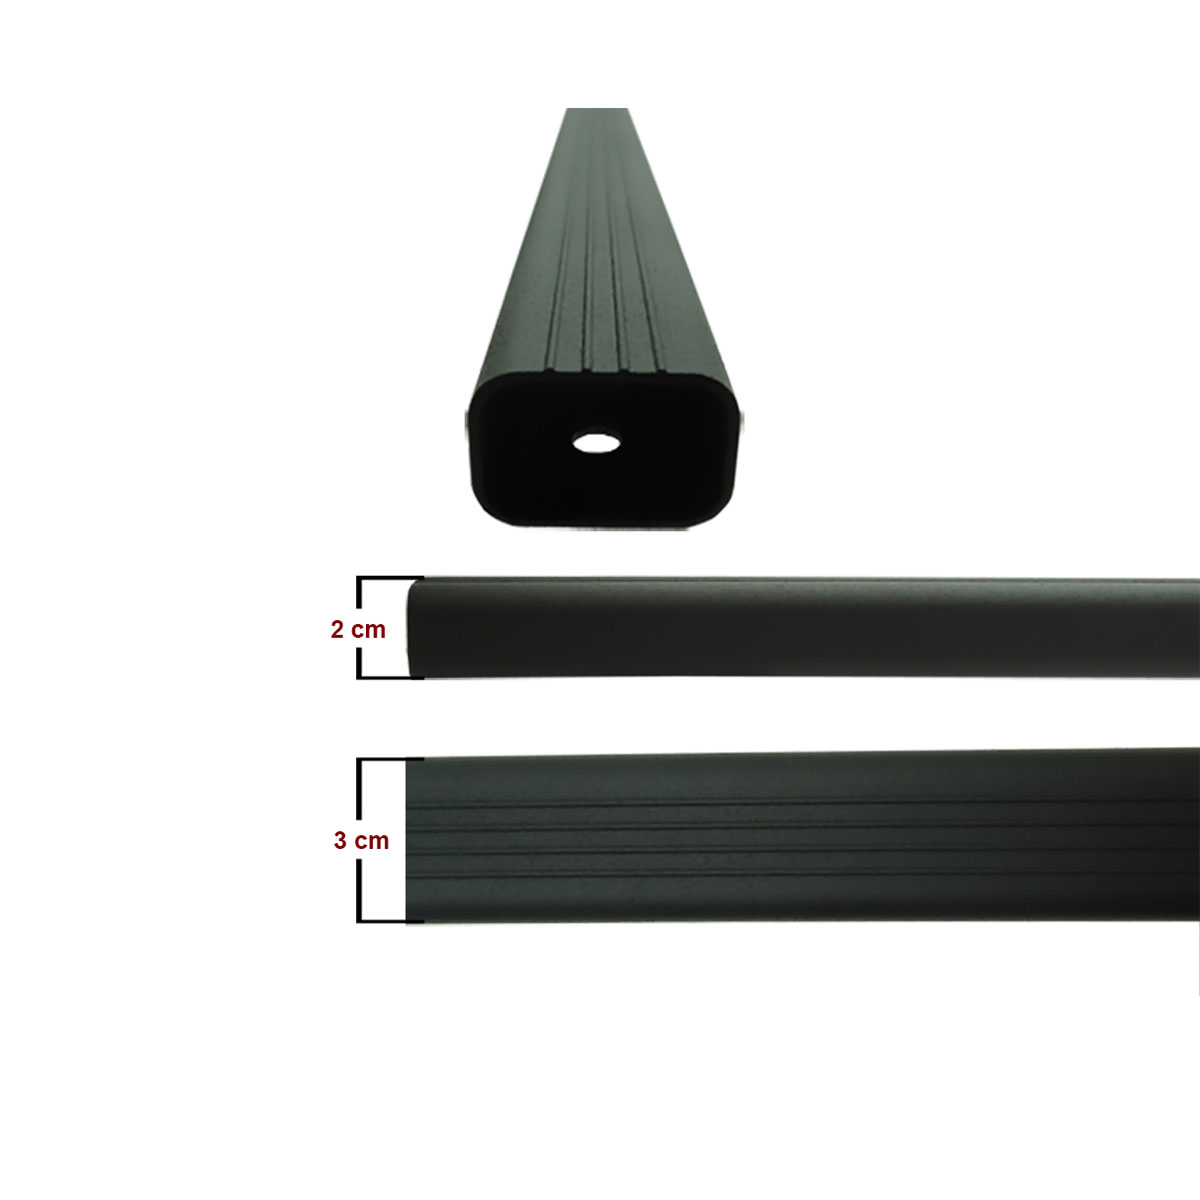 Travessa rack de teto alumínio preta Spacefox 2006 a 2017 ou Space Cross 2012 a 2017 kit 4 peças